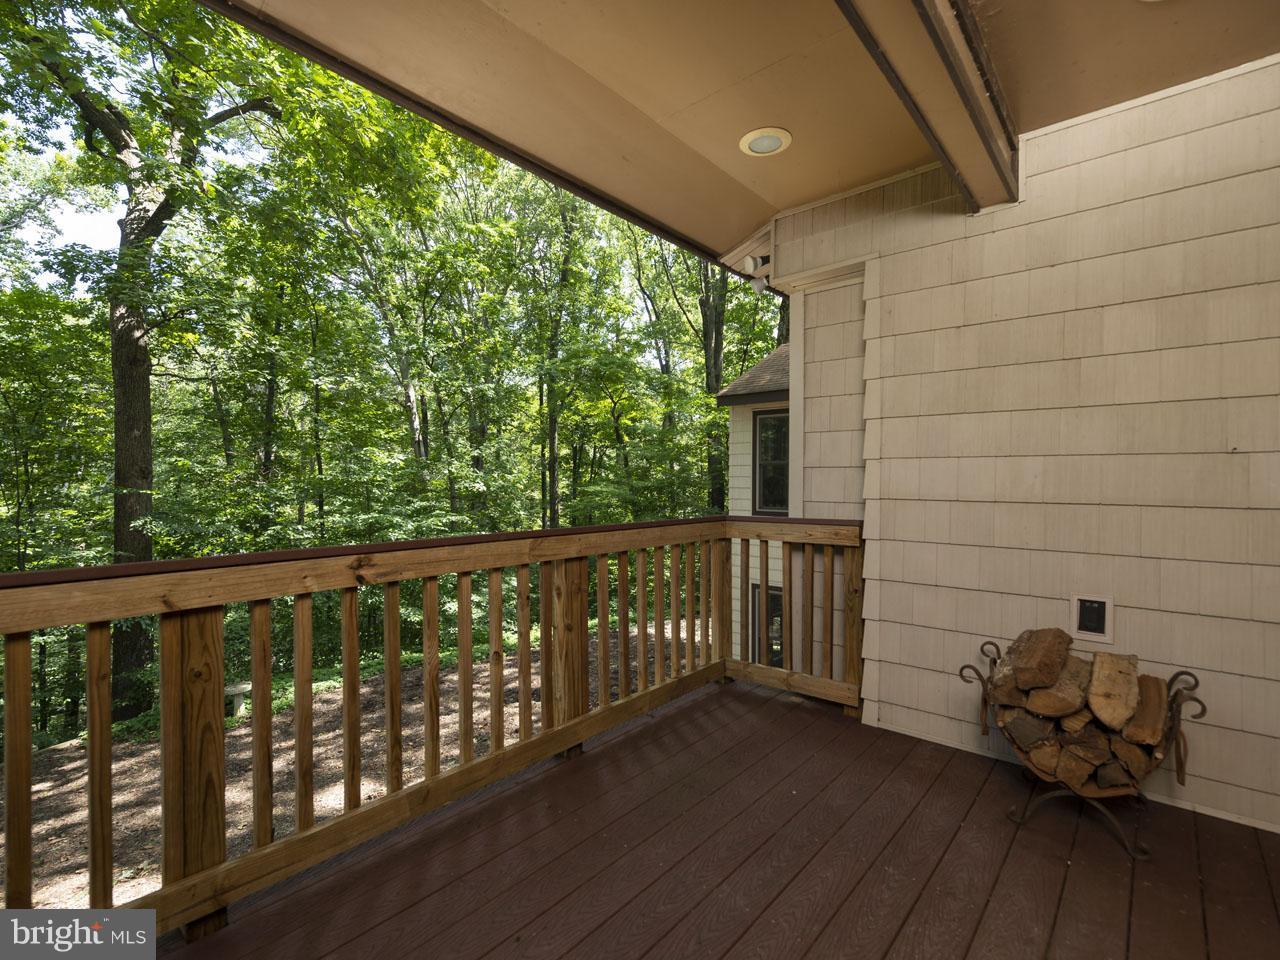 1002303700-300502417925-2021-07-22-03-27-23  |   | Alexandria Delaware Real Estate For Sale | MLS# 1002303700  - Best of Northern Virginia